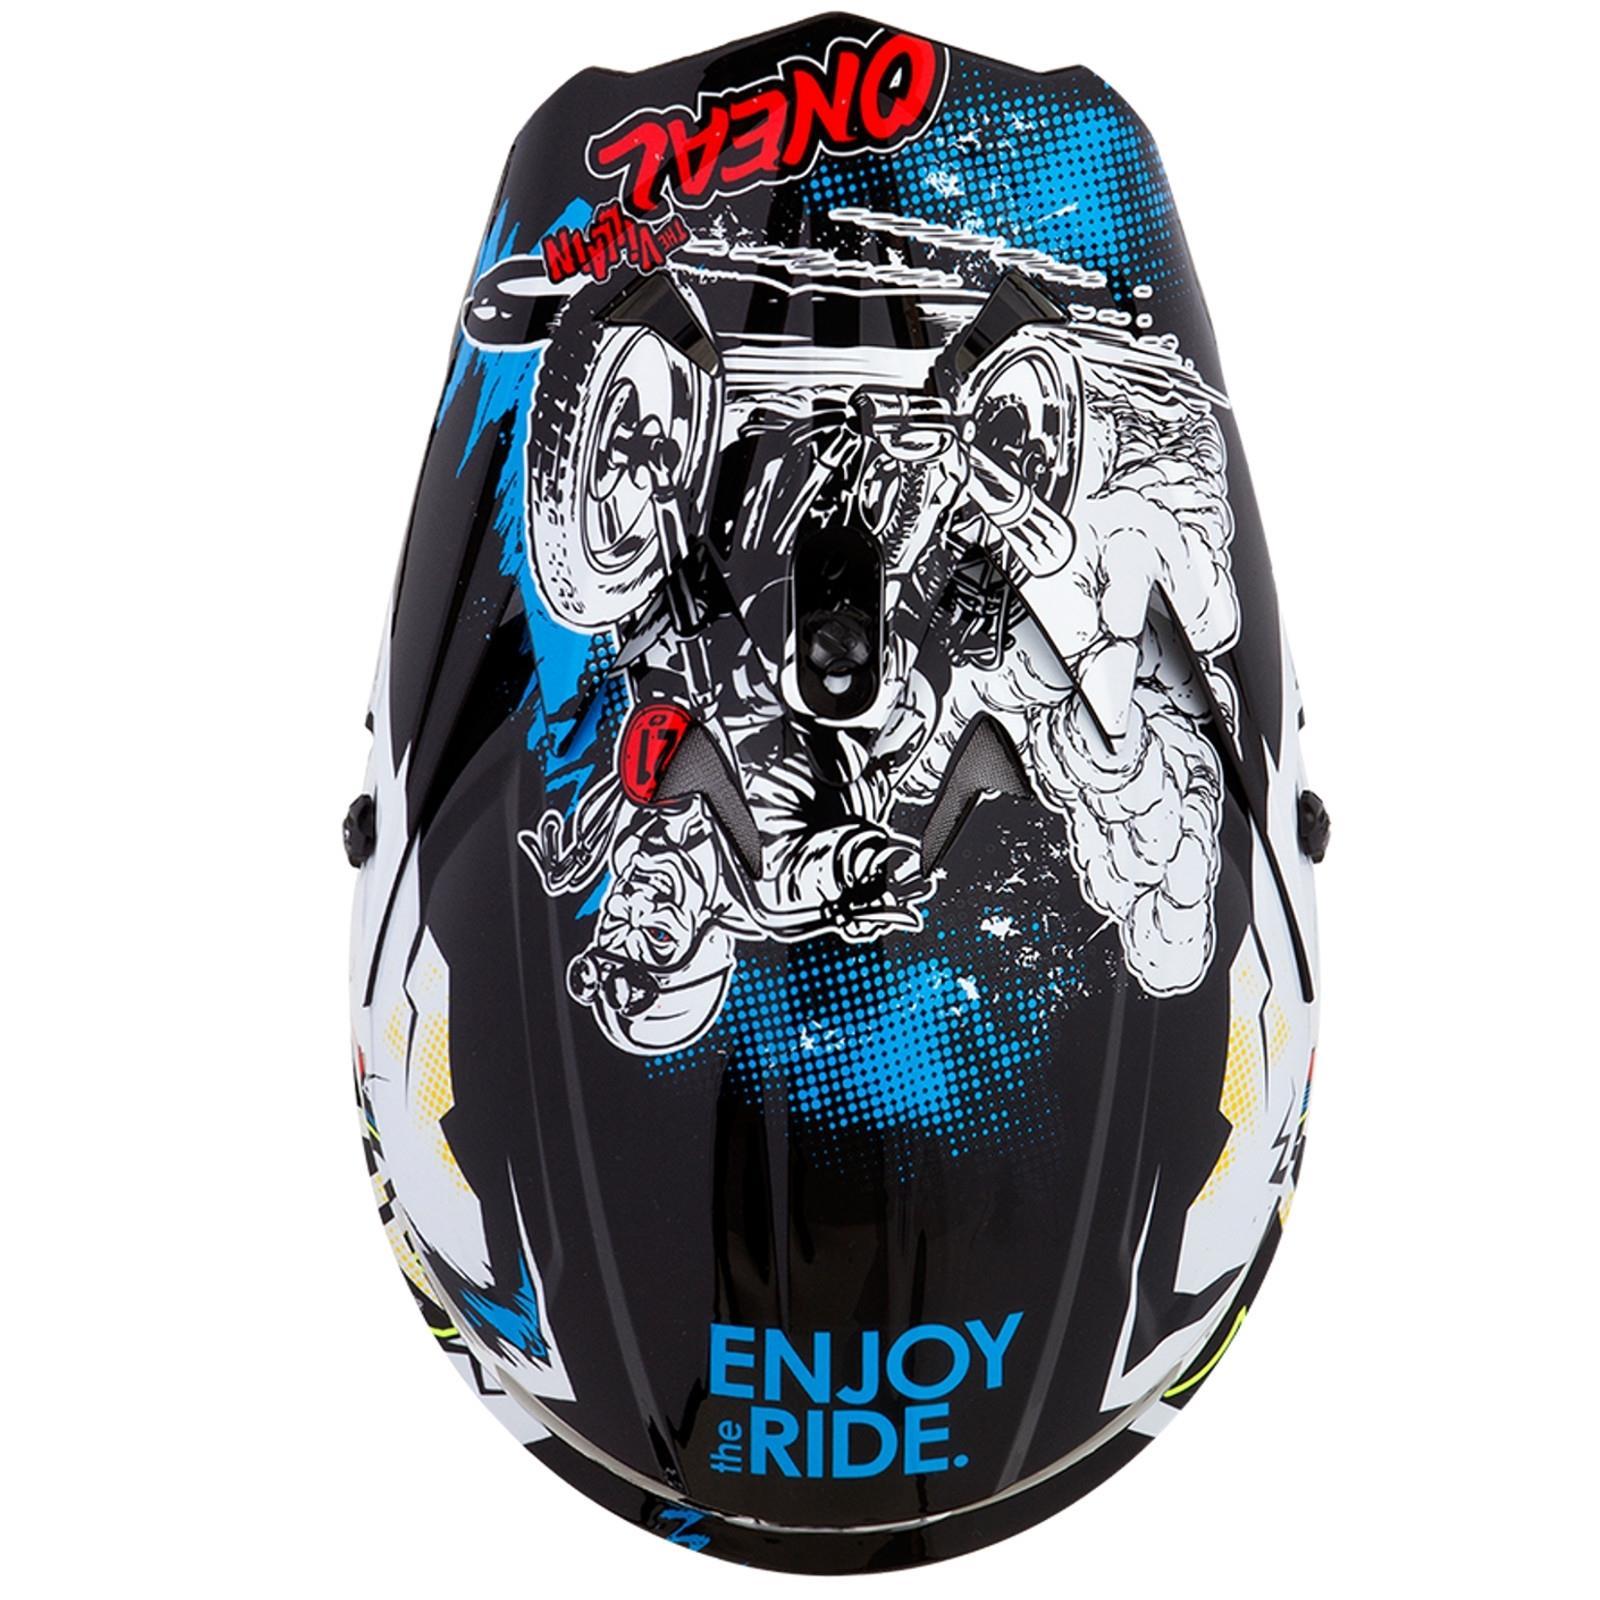 ONeal-Motocross-casco-MX-ENDURO-MOTO-BICI-FUORISTRADA-CROSS-Series-Adventure miniatura 54